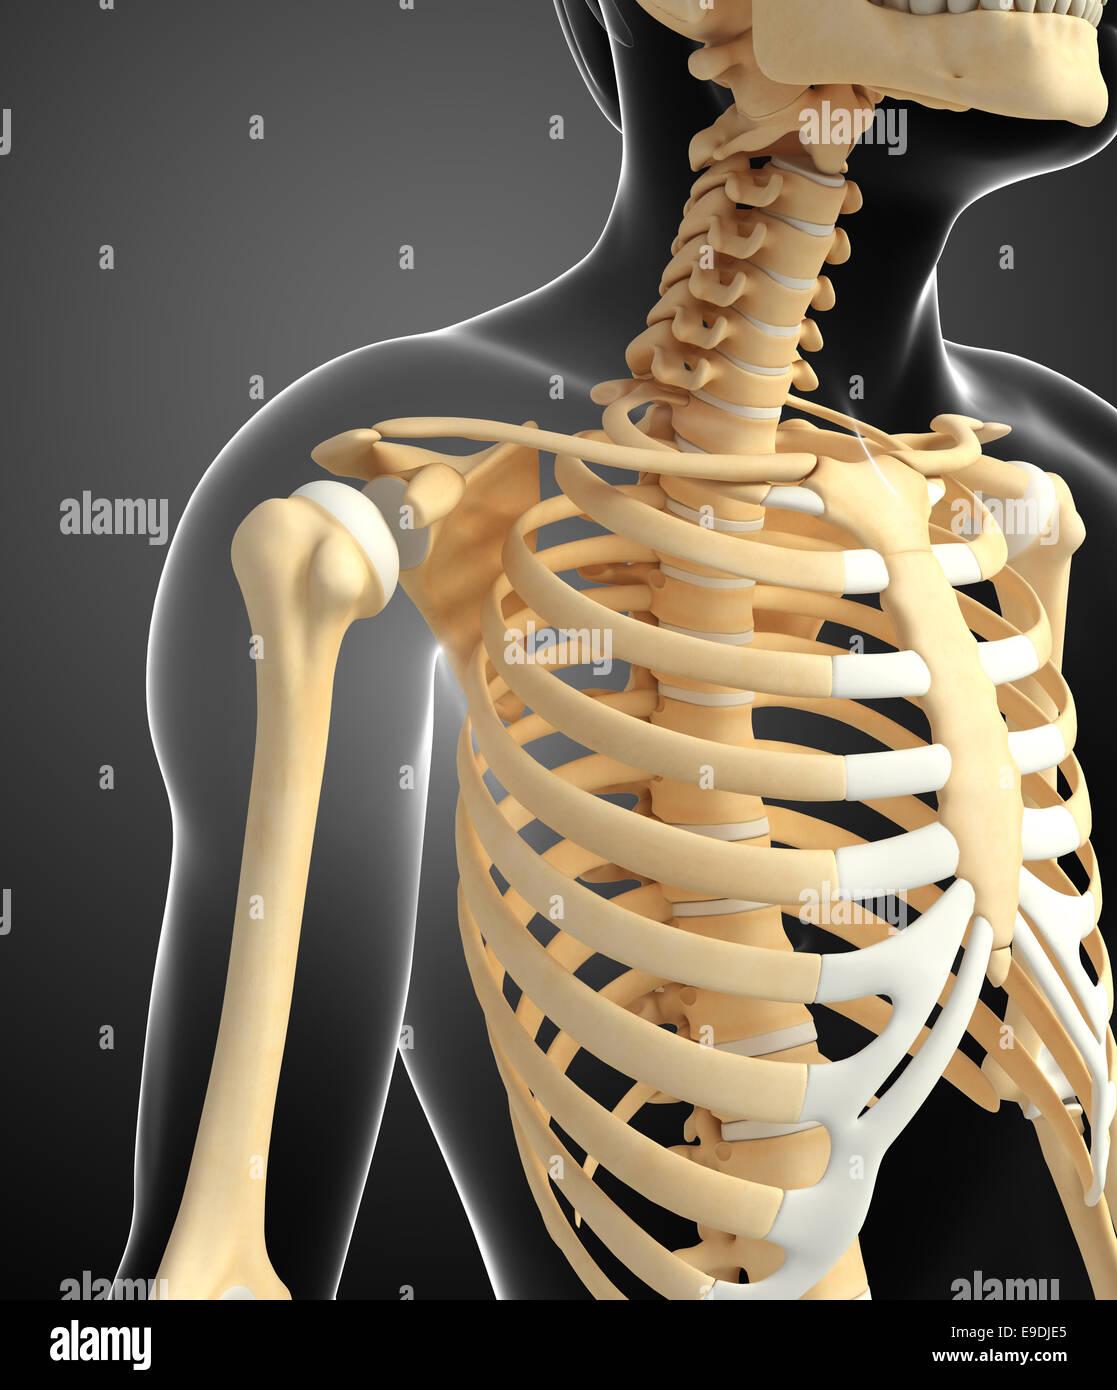 Illustration of shoulder skeleton Stock Photo: 74673261 - Alamy